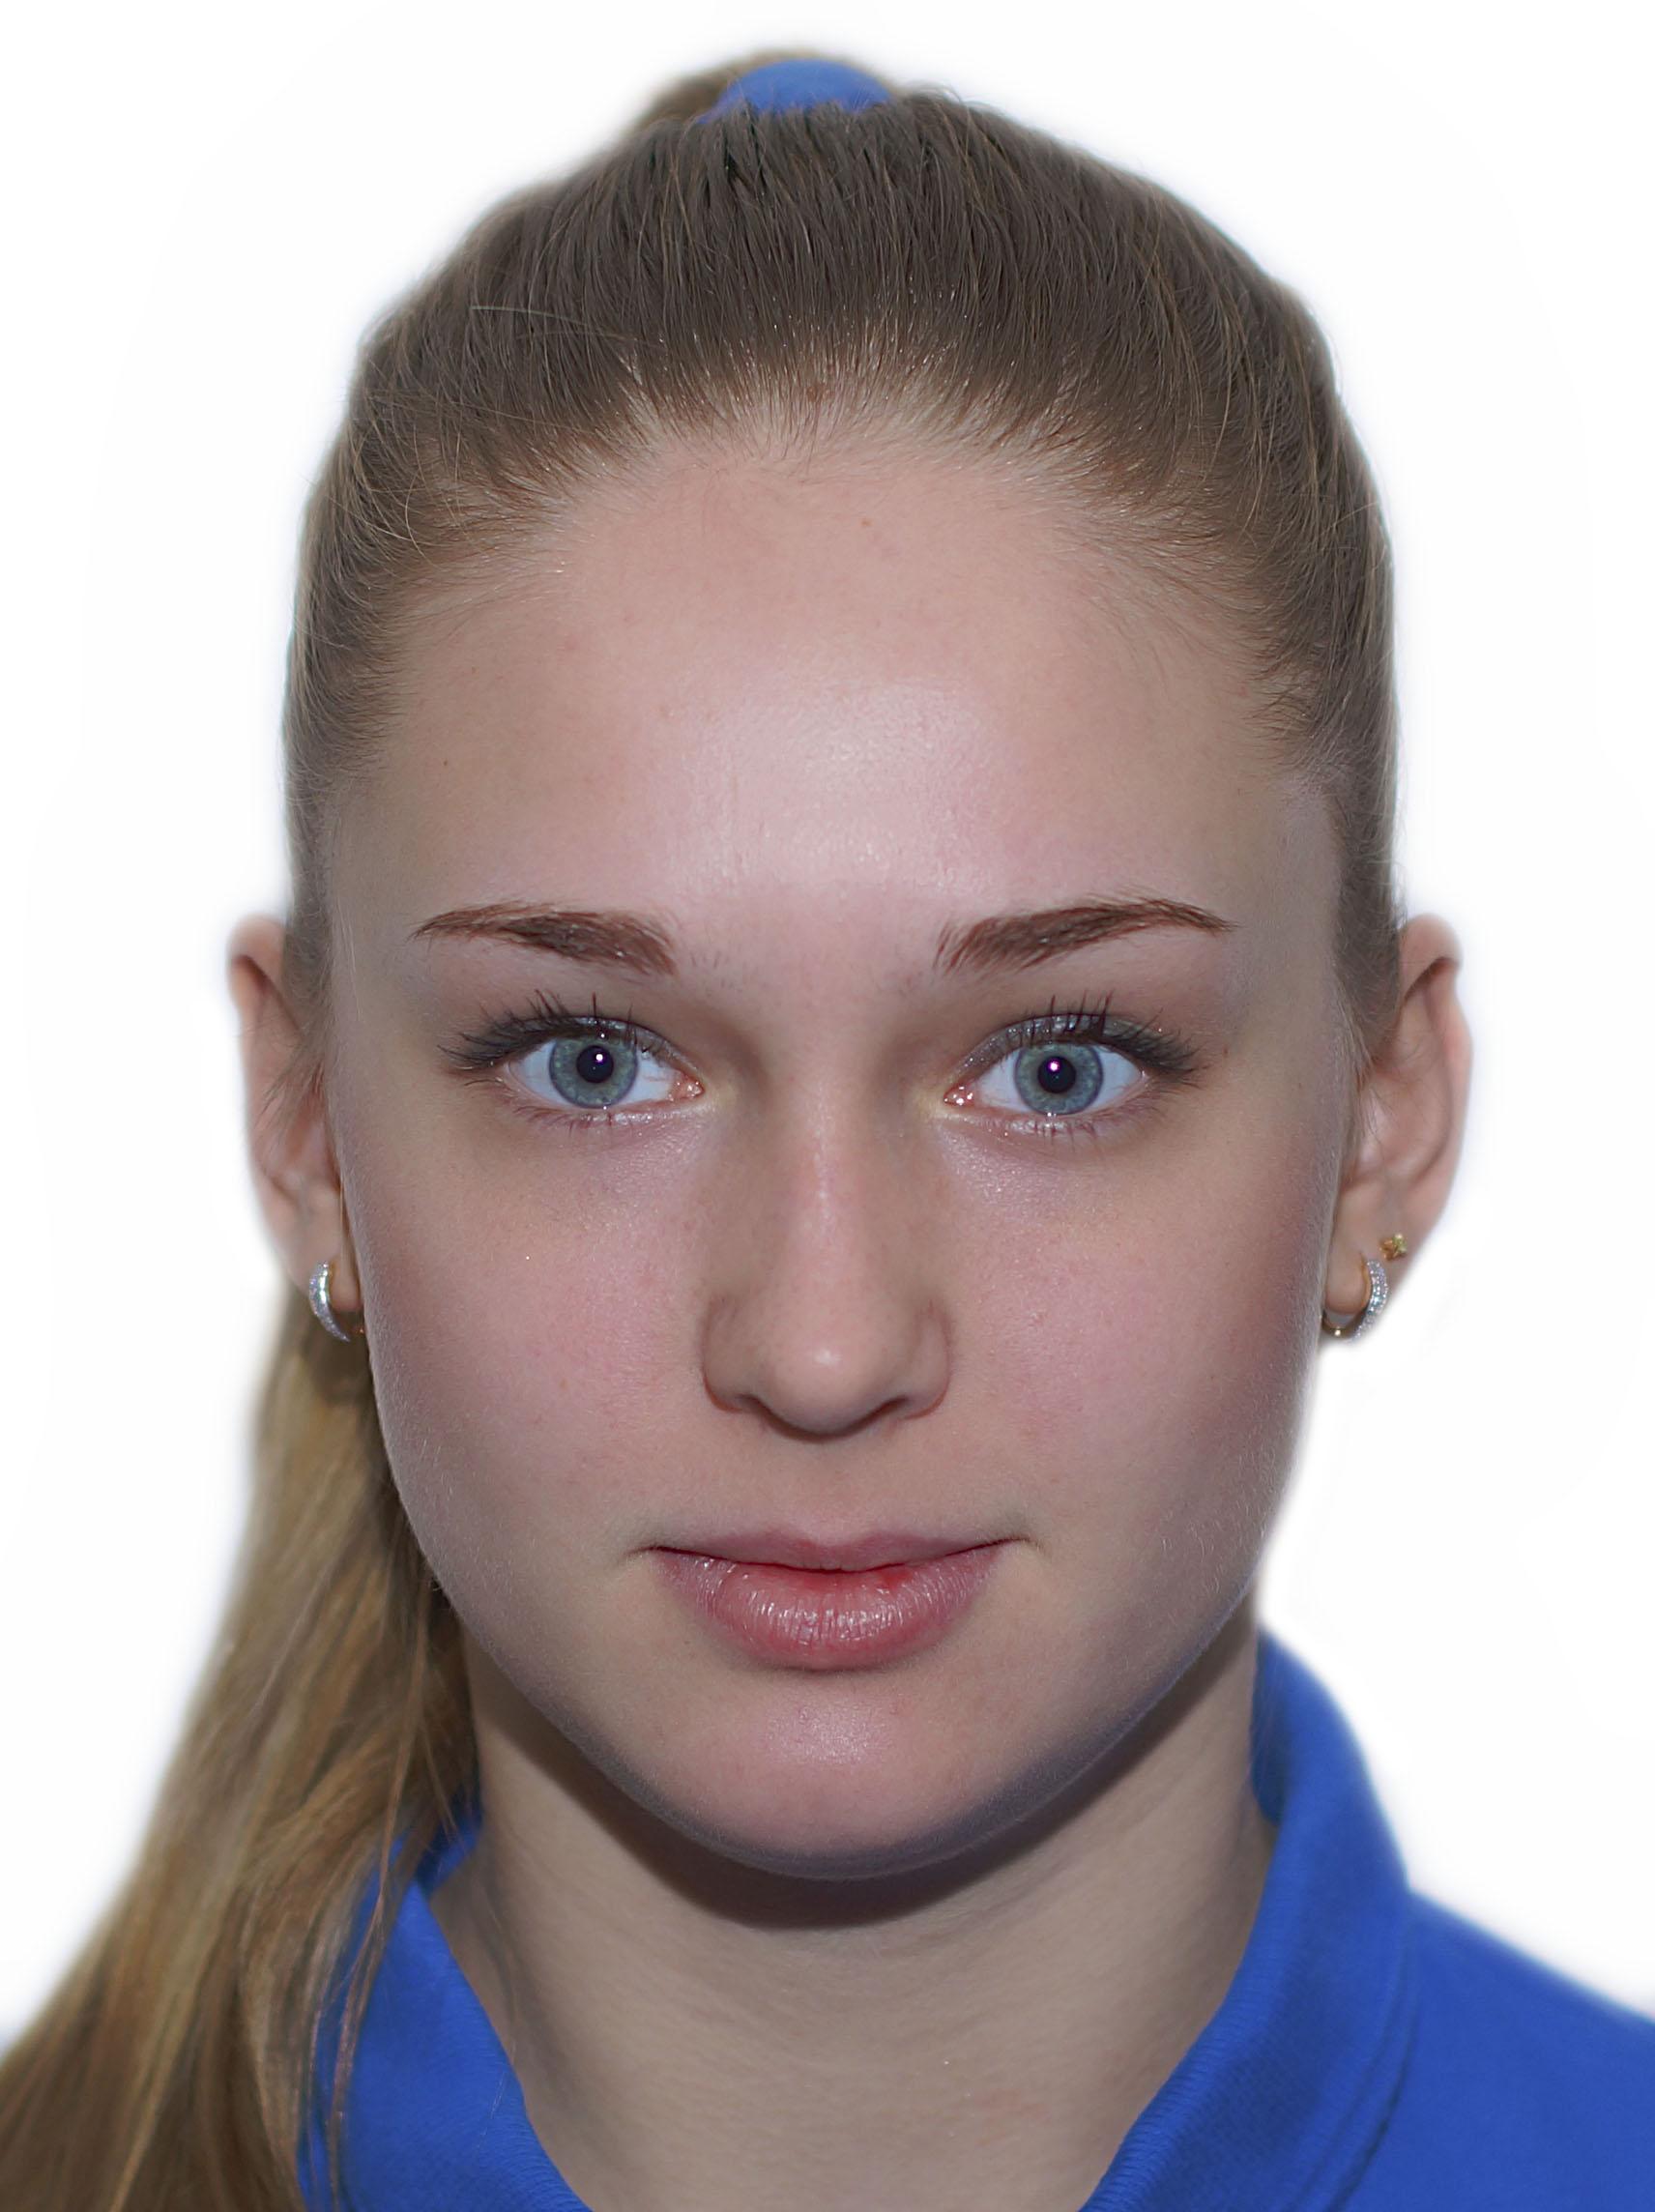 Anastasiia Barchuk